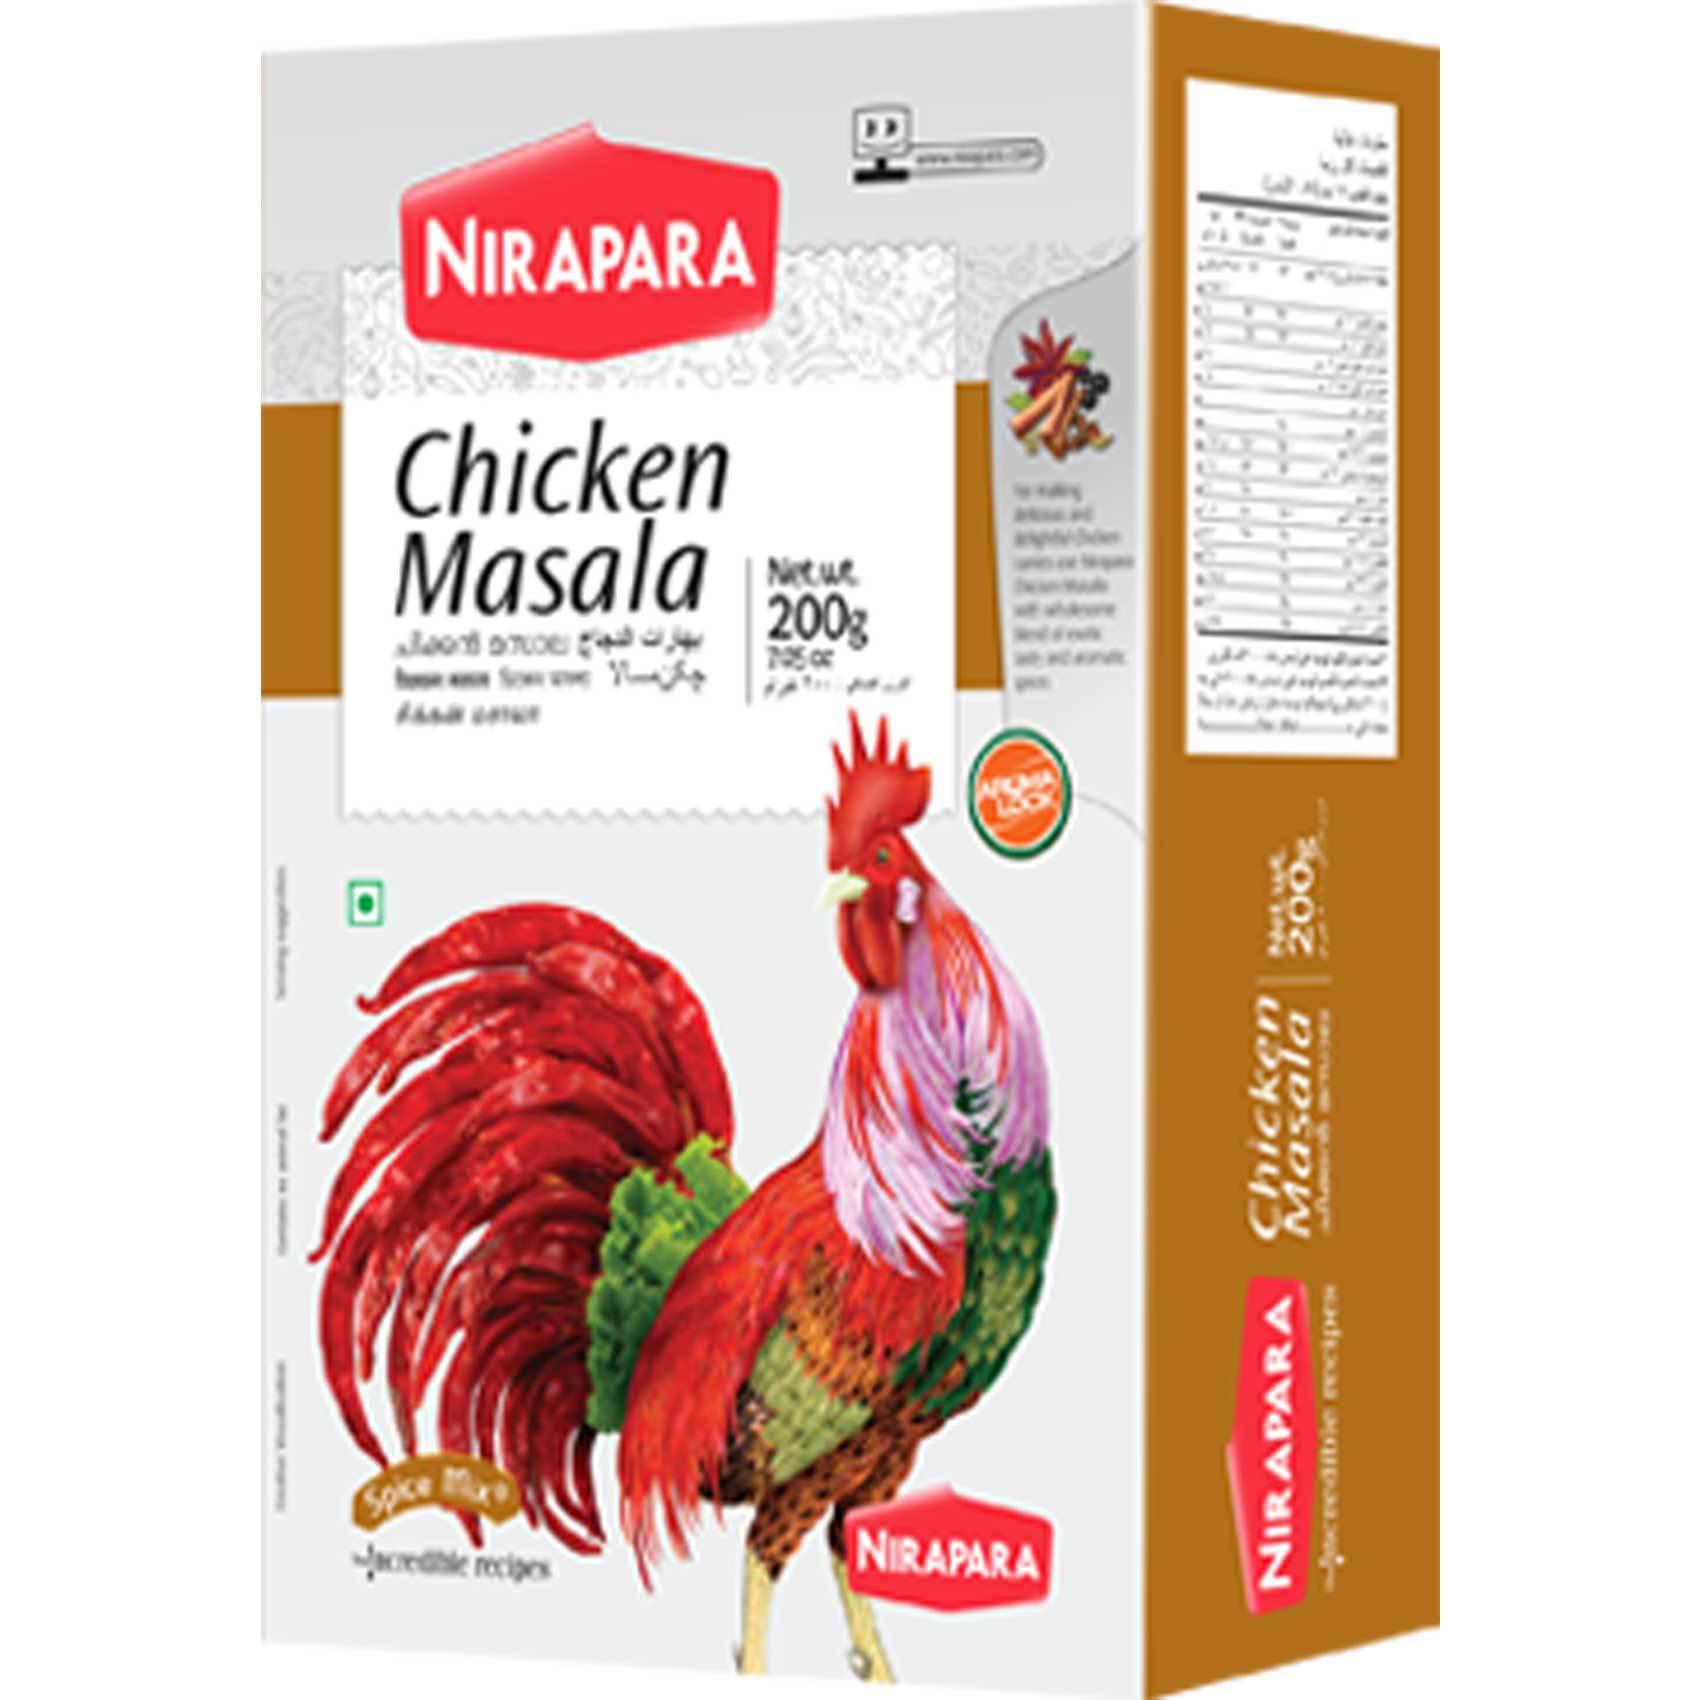 NIRAPARA CHICKEN MASALA 200G